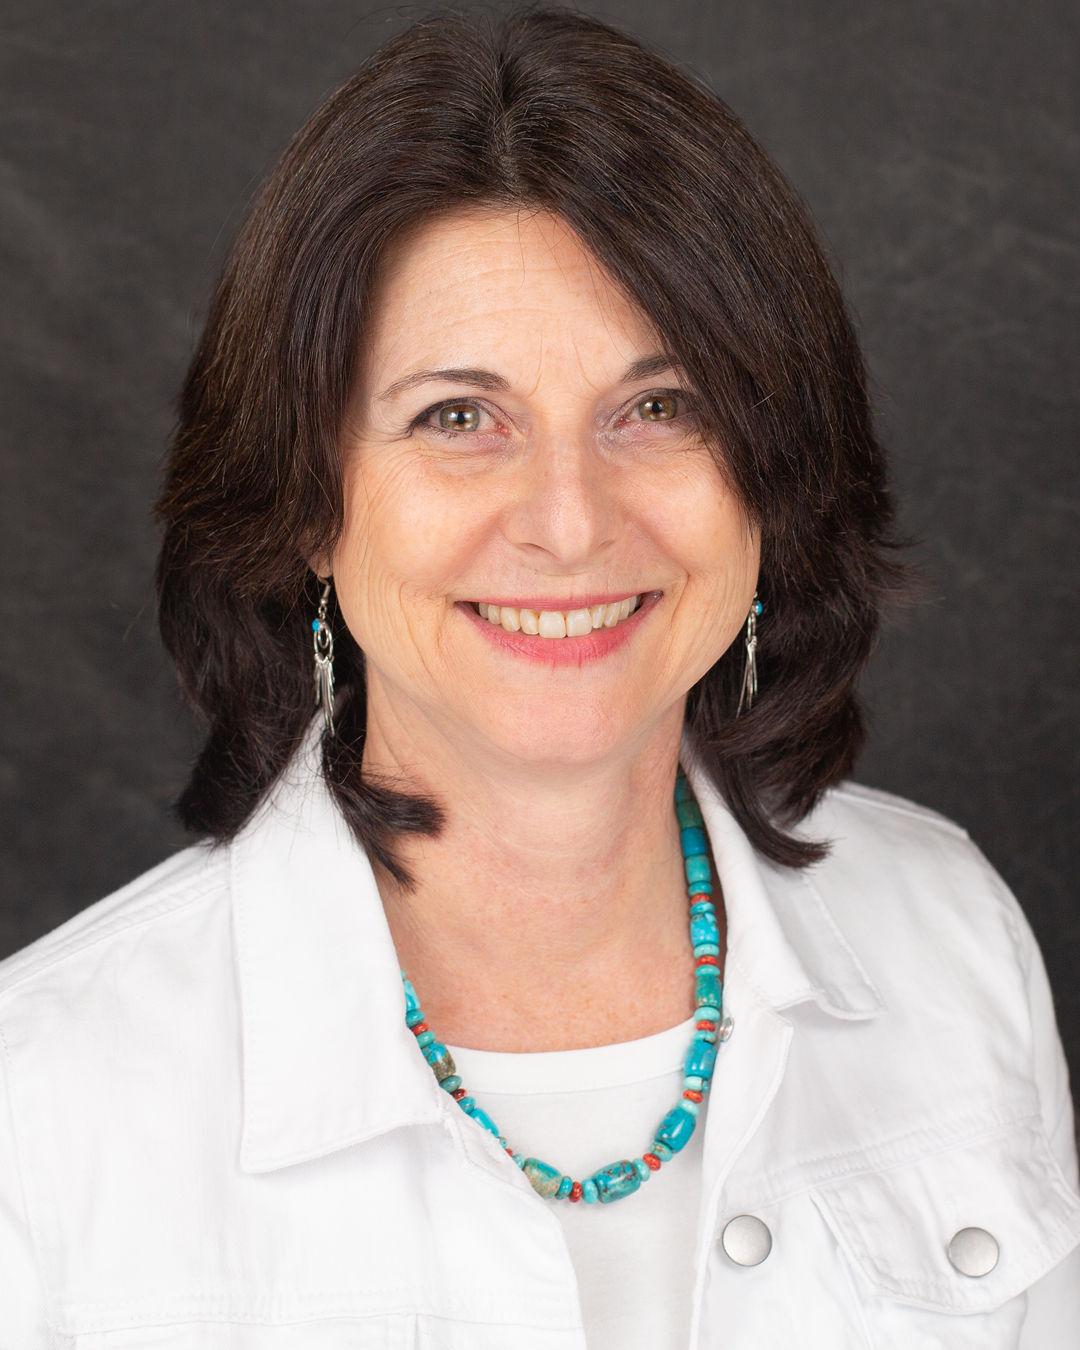 Holly Donaldson, financial advisor Tampa FL